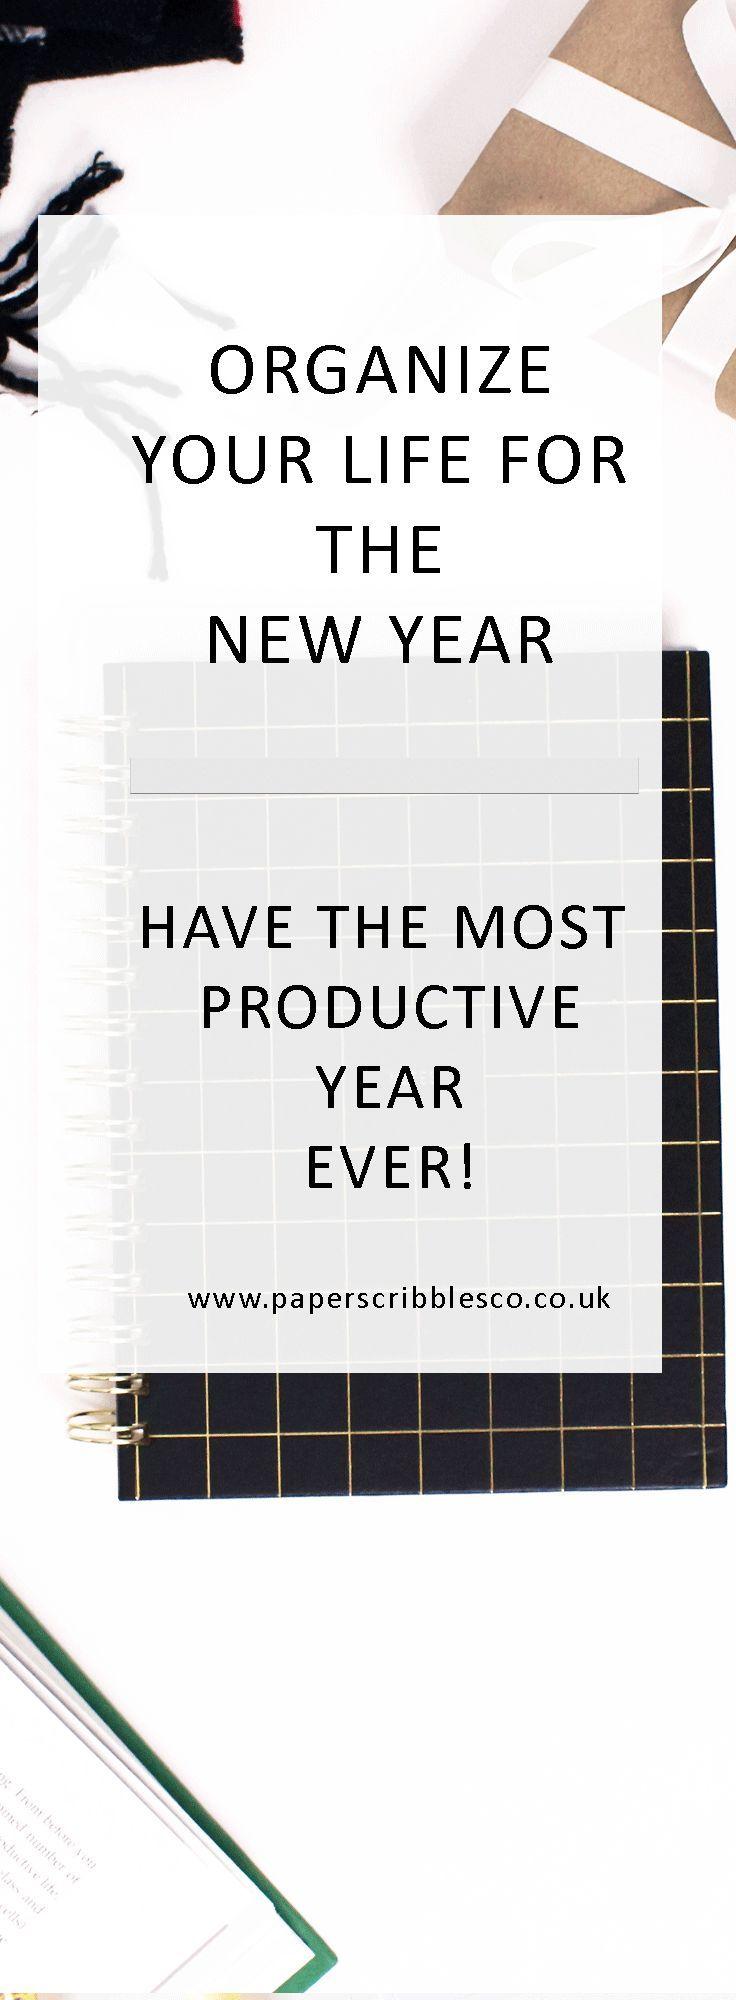 2018 Planners | Planner Organization | New Year Goals | New Year Resolutions | Organization | Productivity | 2018 Goals | Goal Setting | Goal Planner